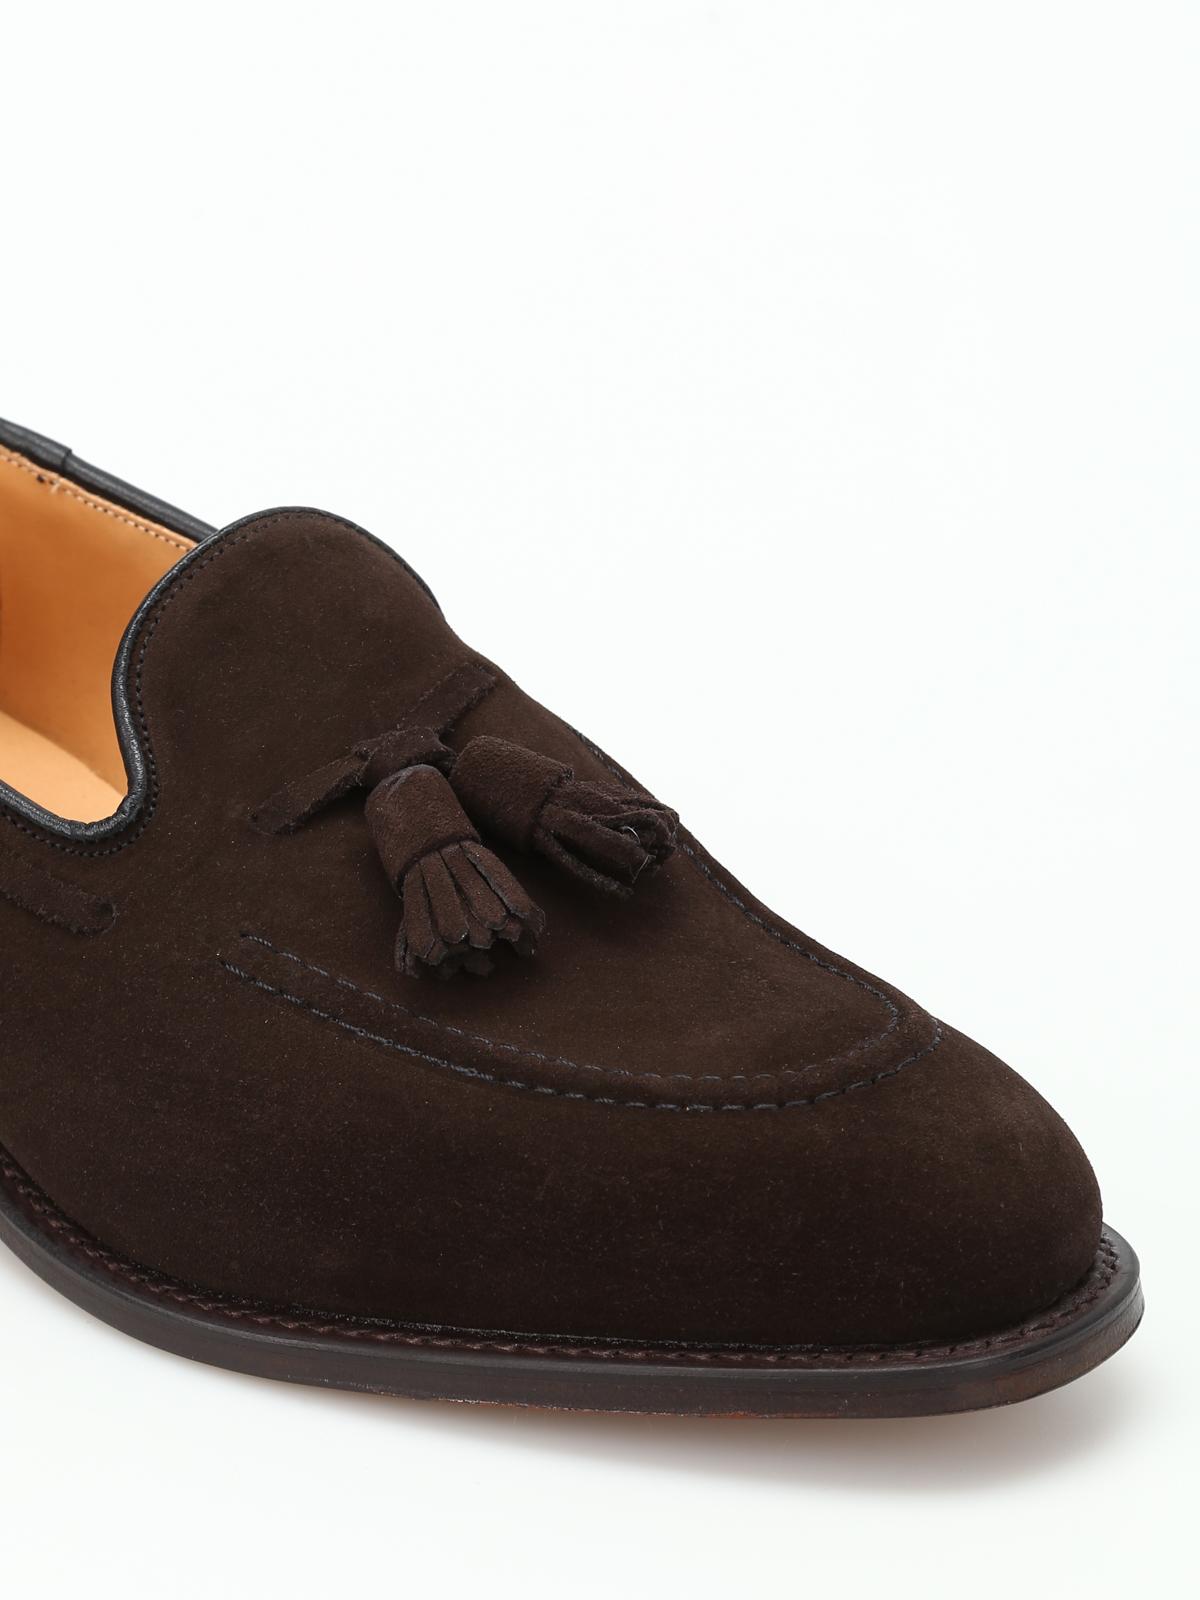 Moncler Shoes Uk